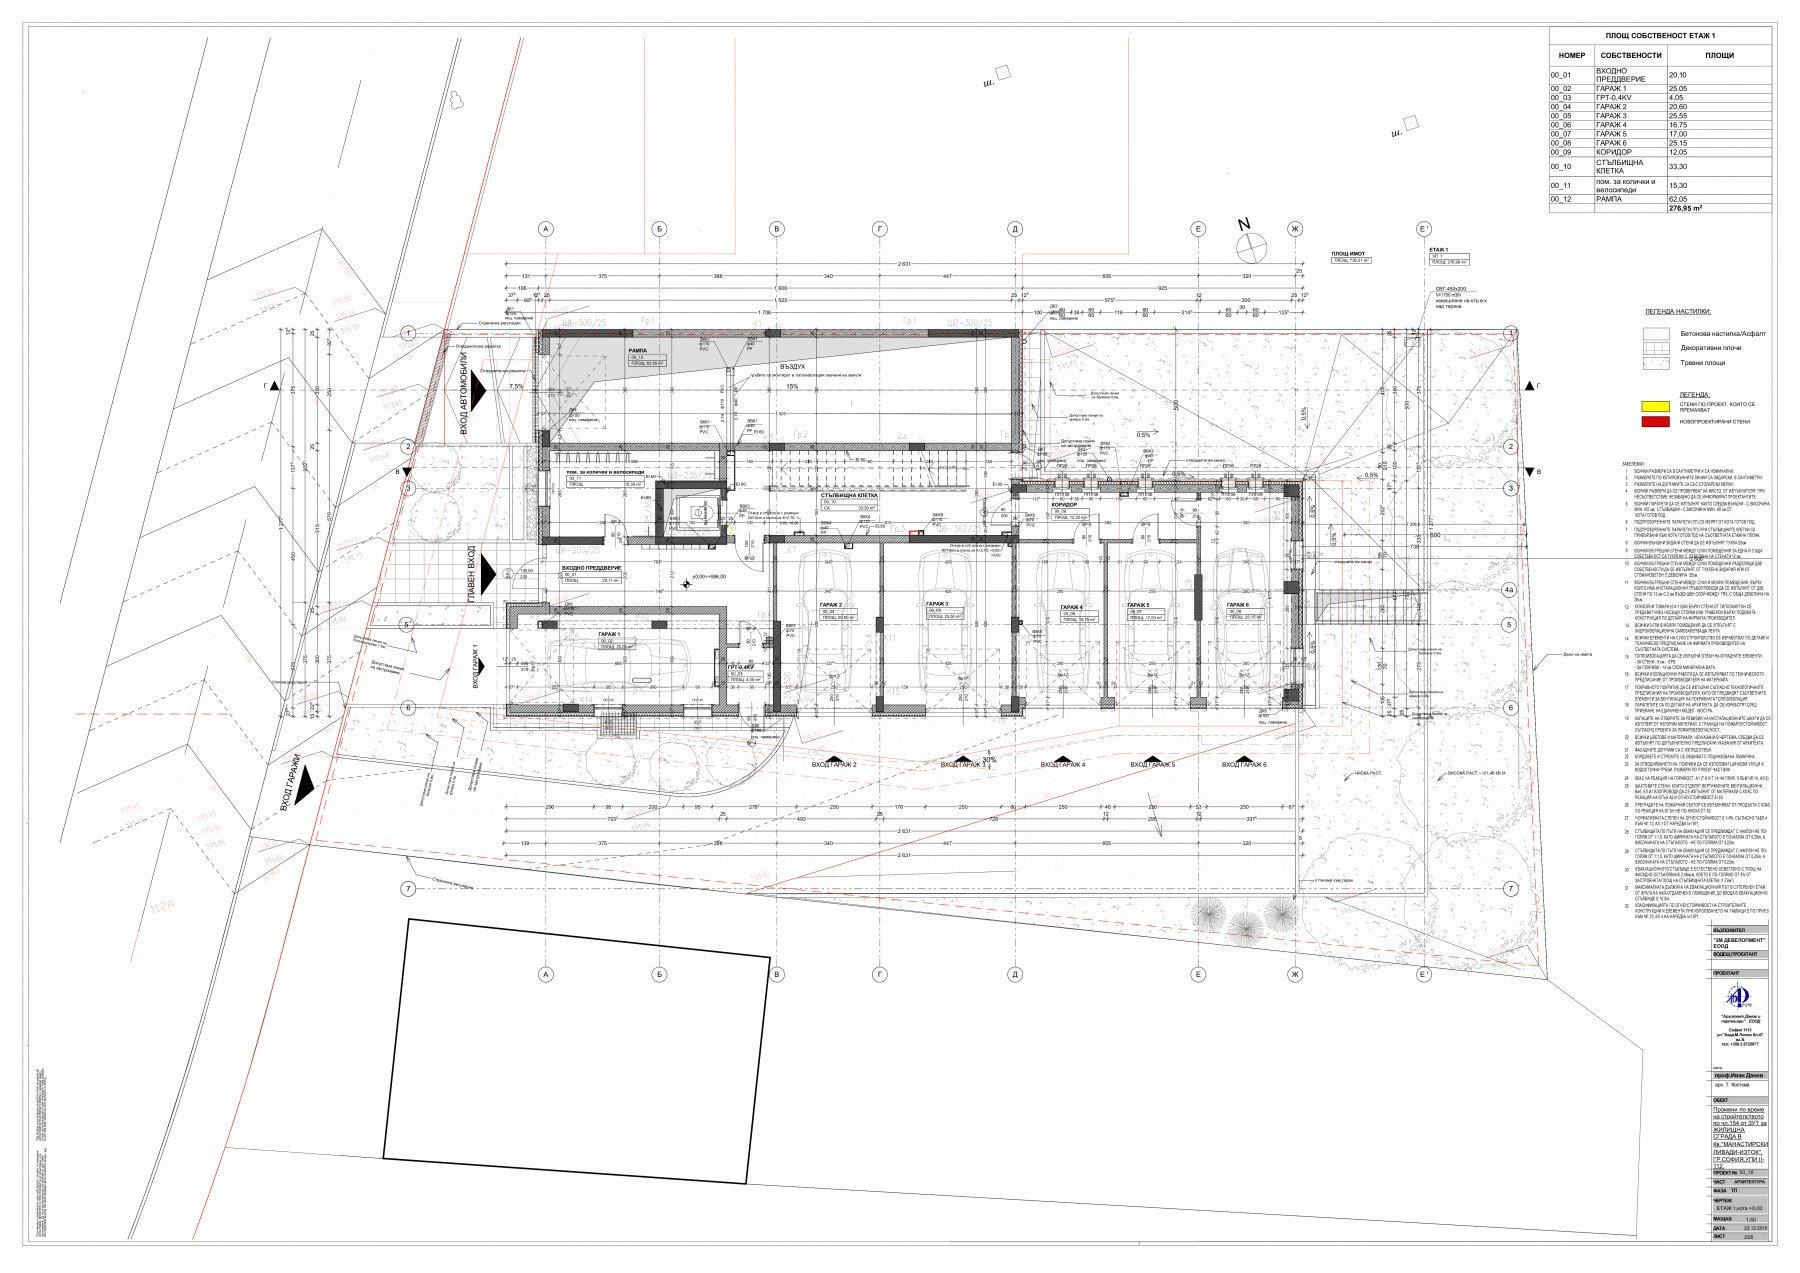 Архитектурни планове на Варвара Хаус